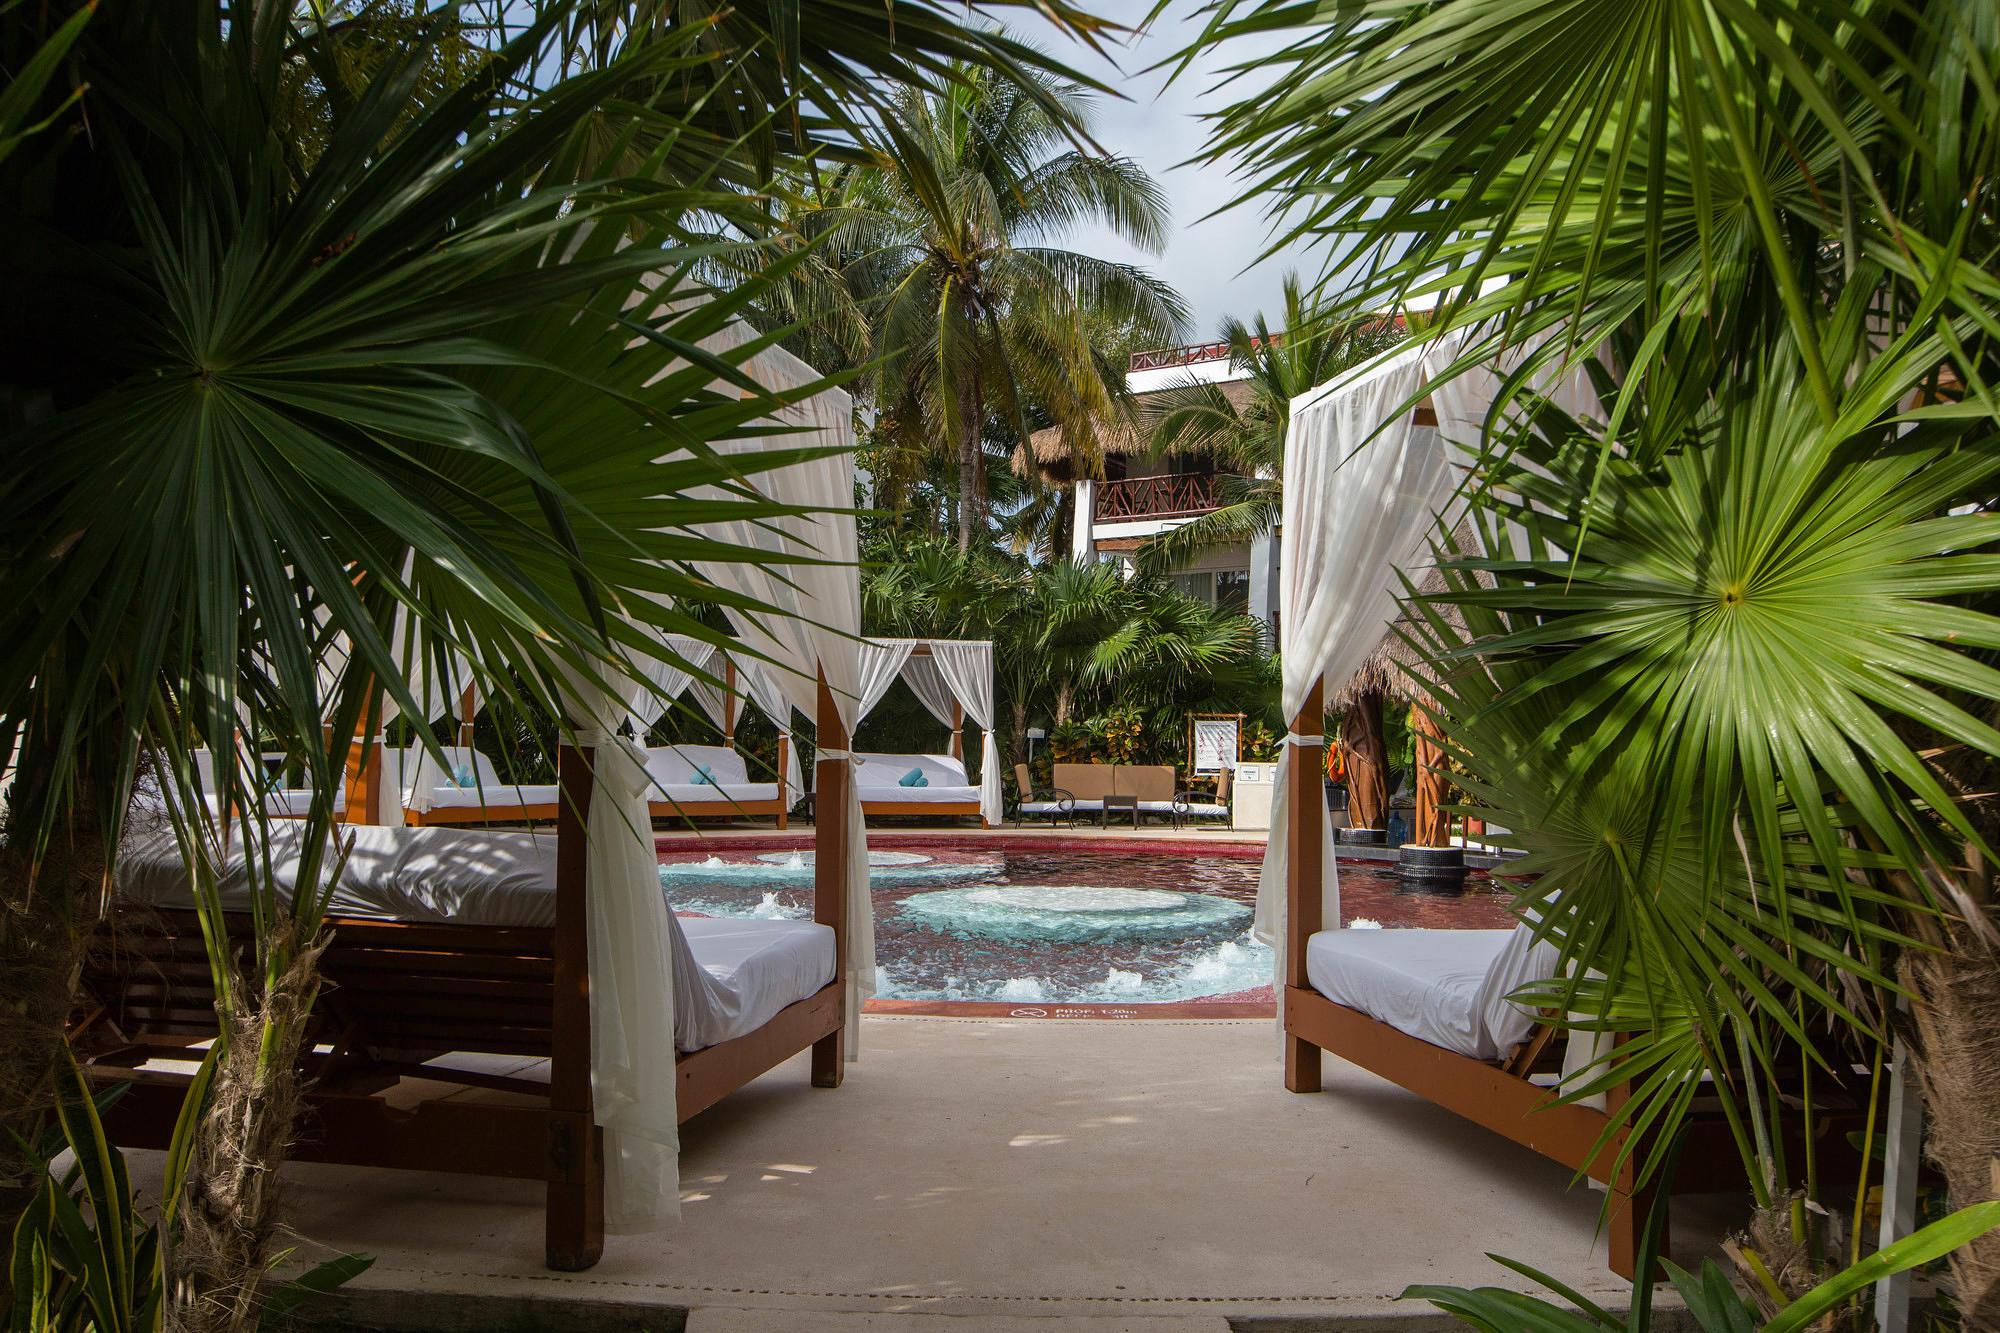 The Wet spot at the Desire Riviera Maya Pearl Resort